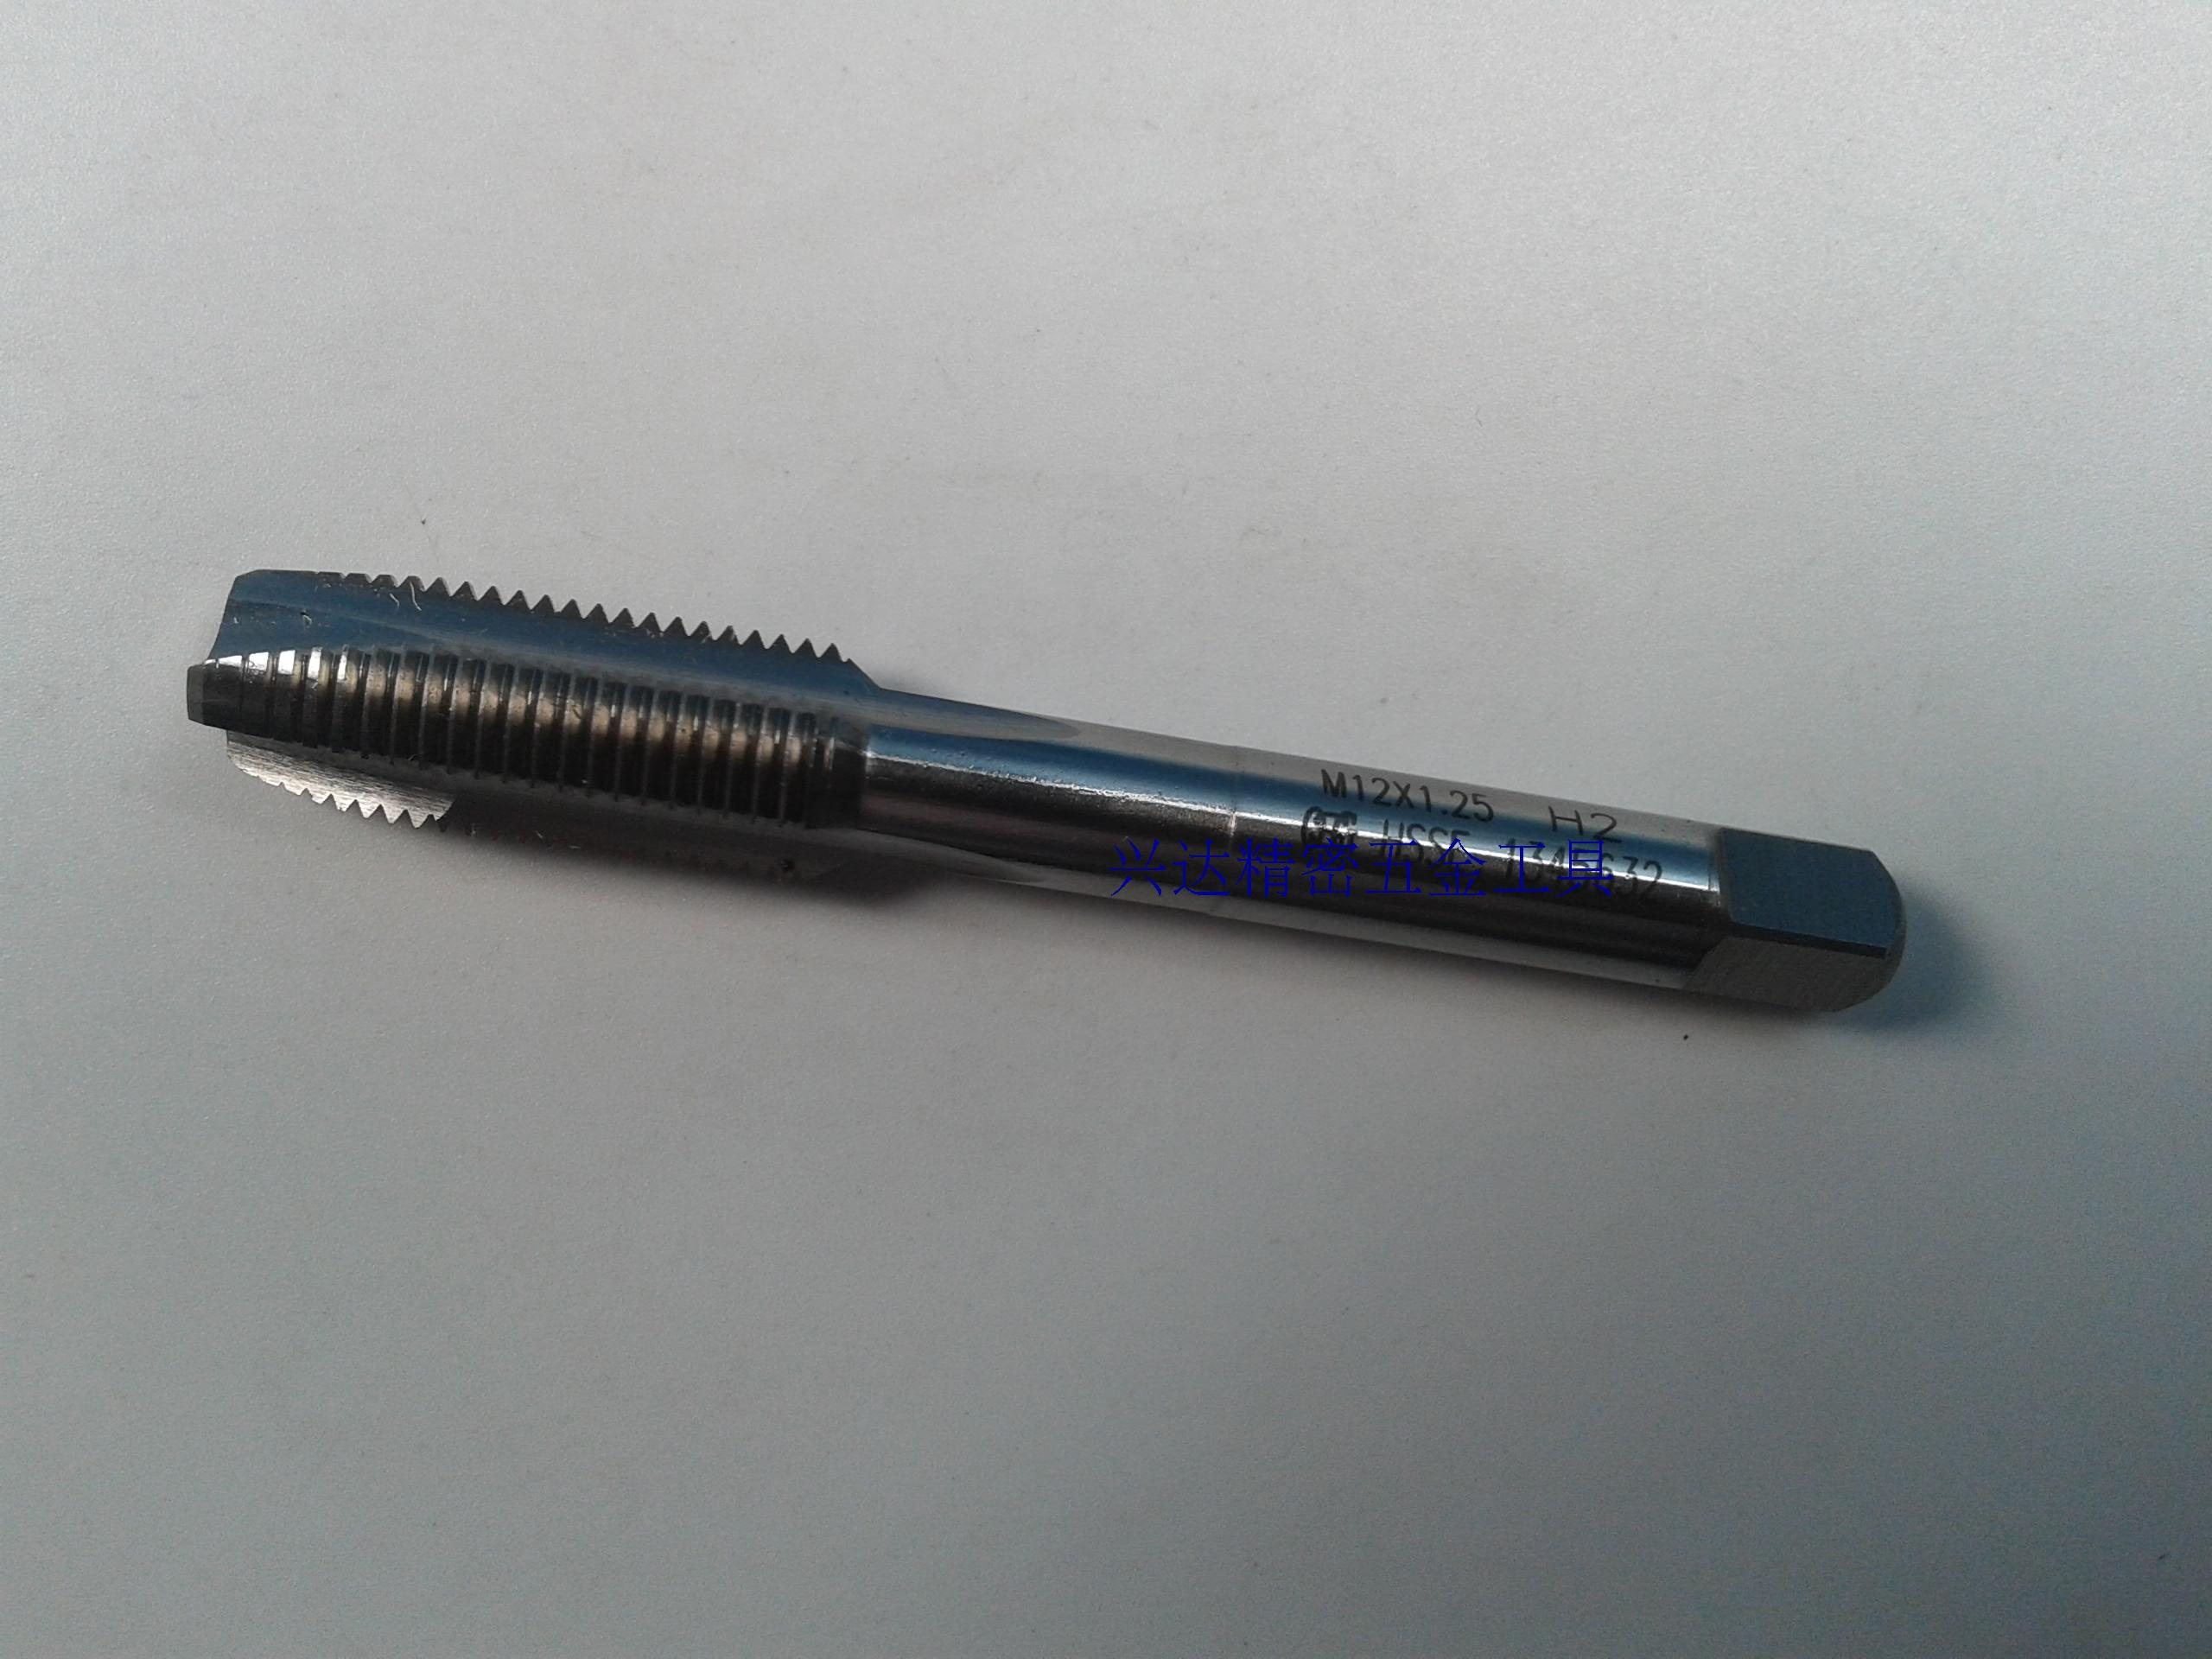 Japanese OSG screw pointed end tap M6M8*1.25M7*0.75M10*0.5M11*1M12*1.75 tap